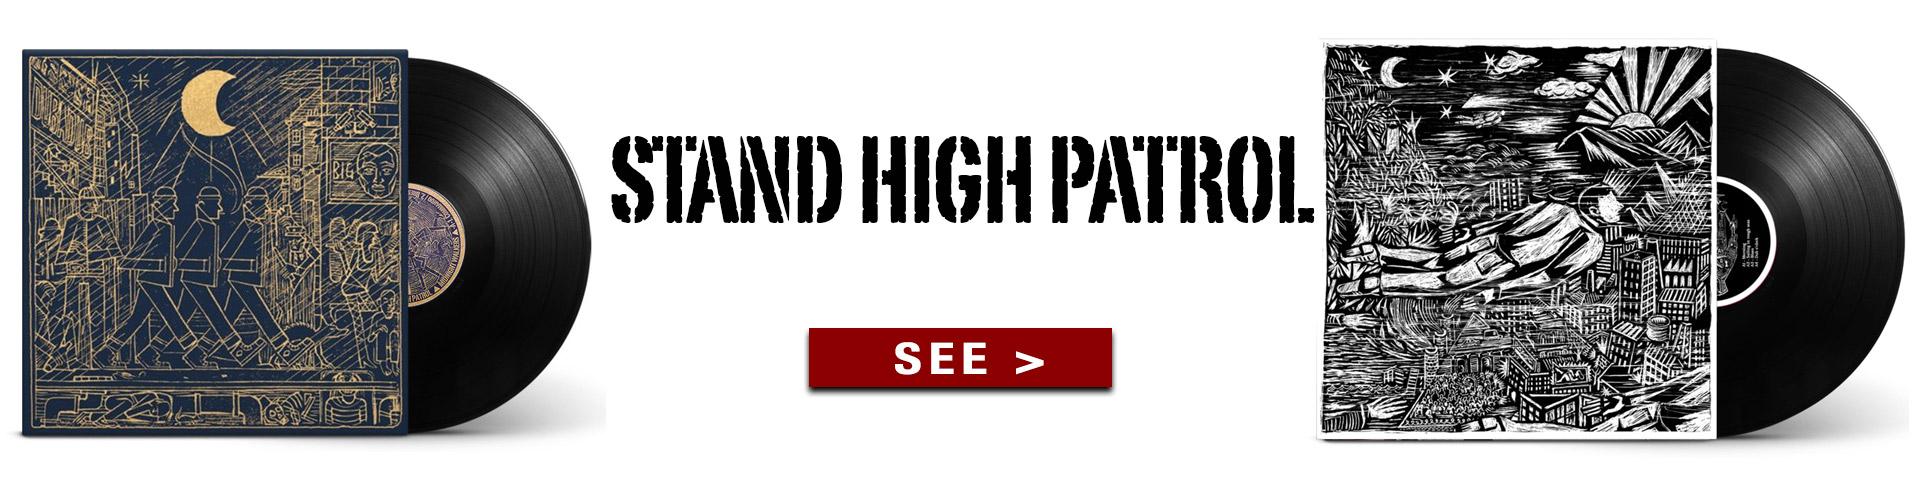 Stand-high-patrol-vinyls